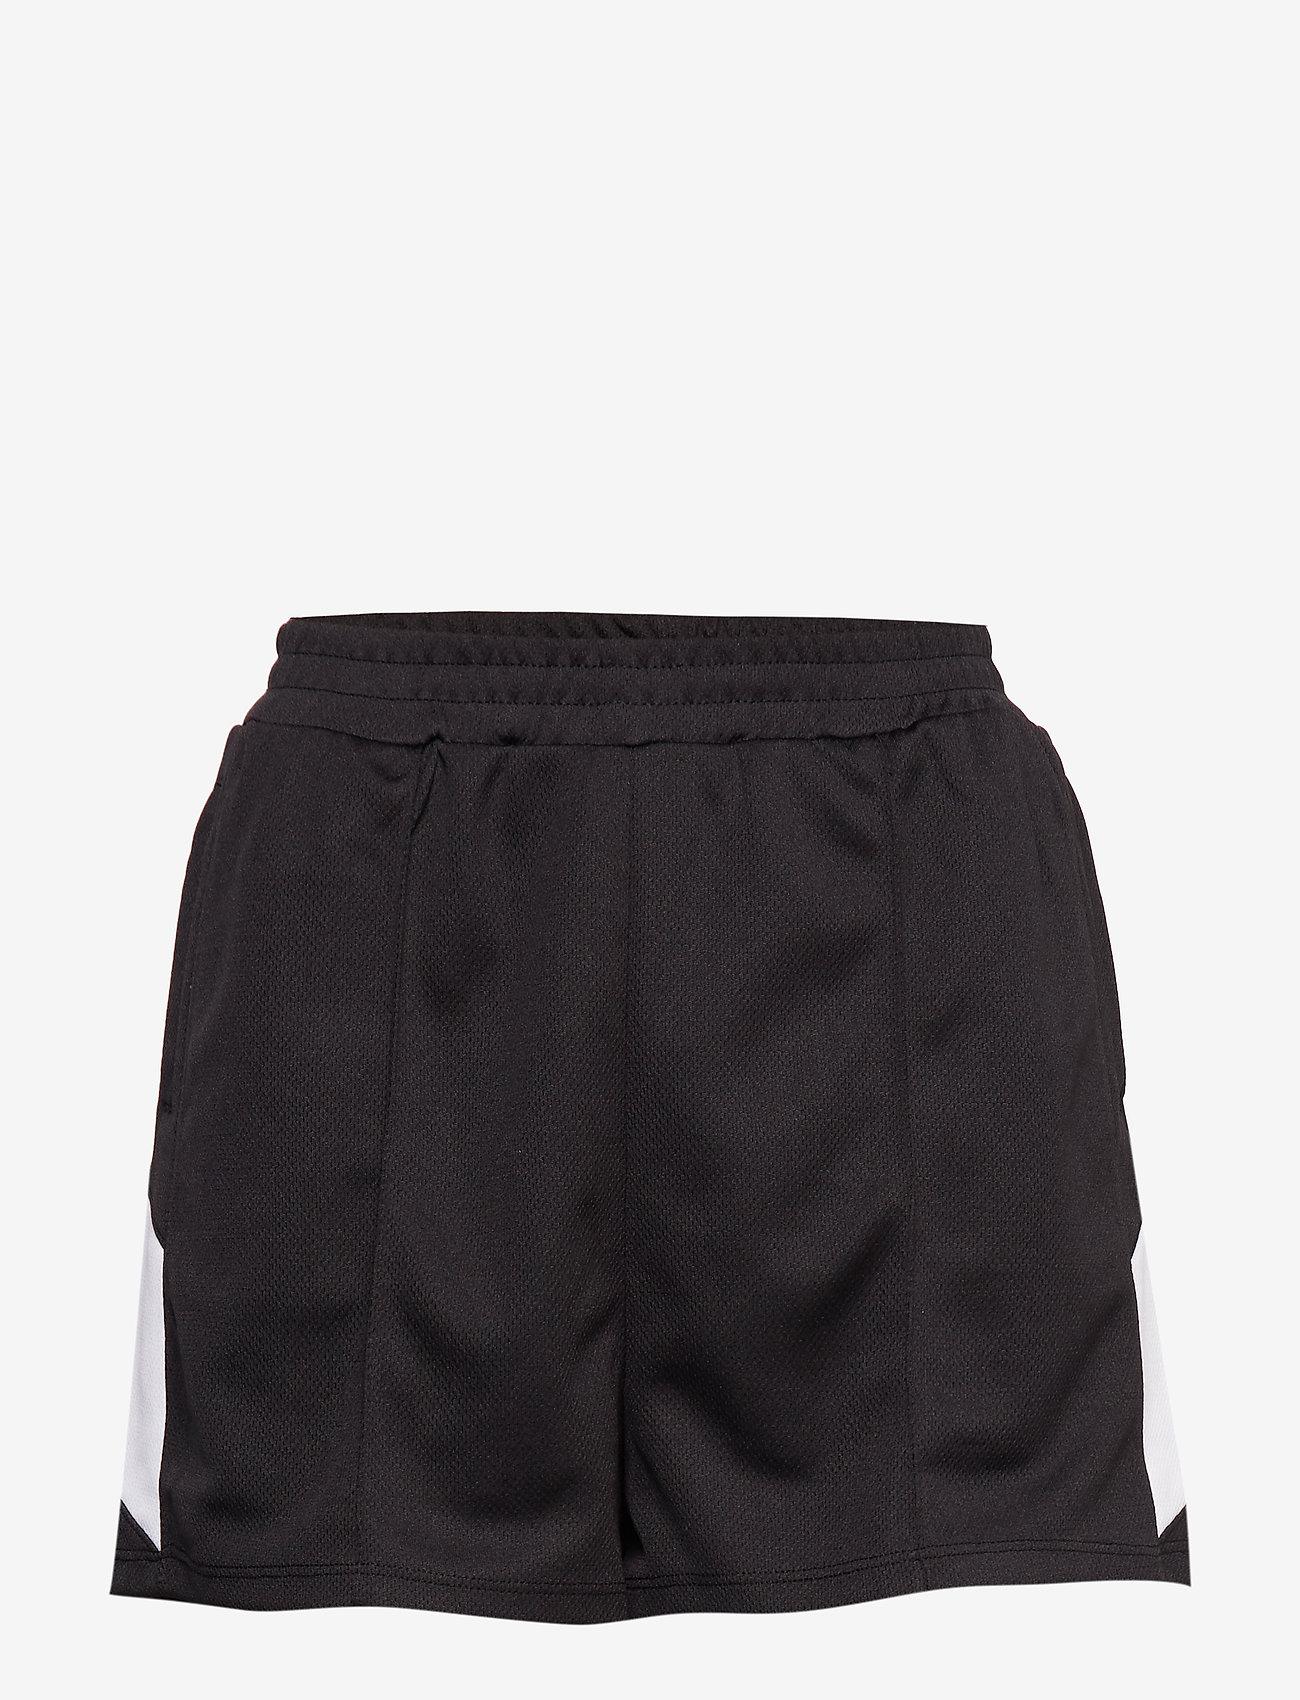 High Waist Side Panel Shorts (Black) - Ivyrevel aWMfGF